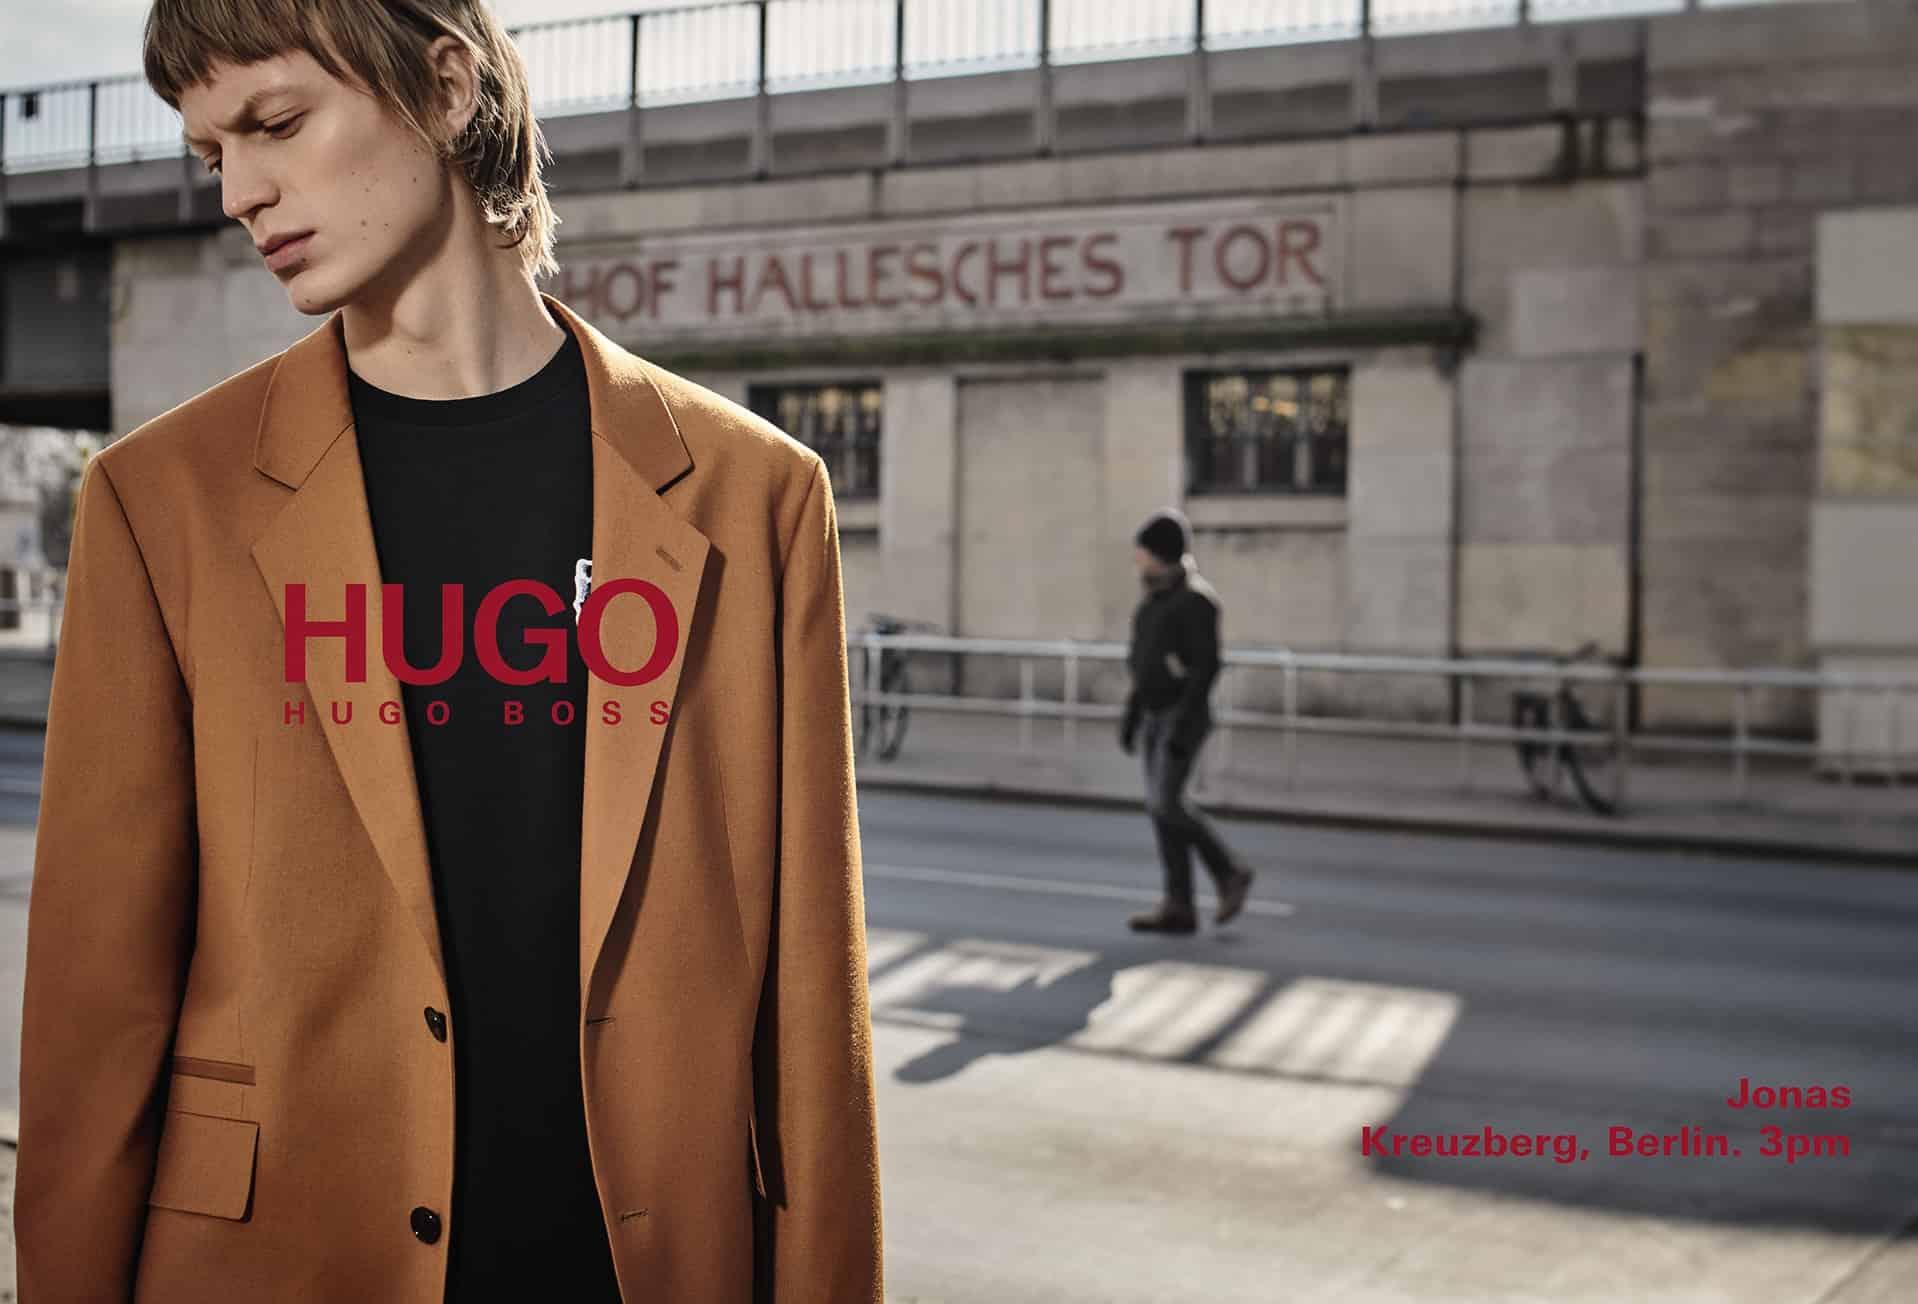 d63e31e83187 HUGO BOSS UNVEILS FALL CAMPAIGNS FOR ITS BOSS AND HUGO LINES